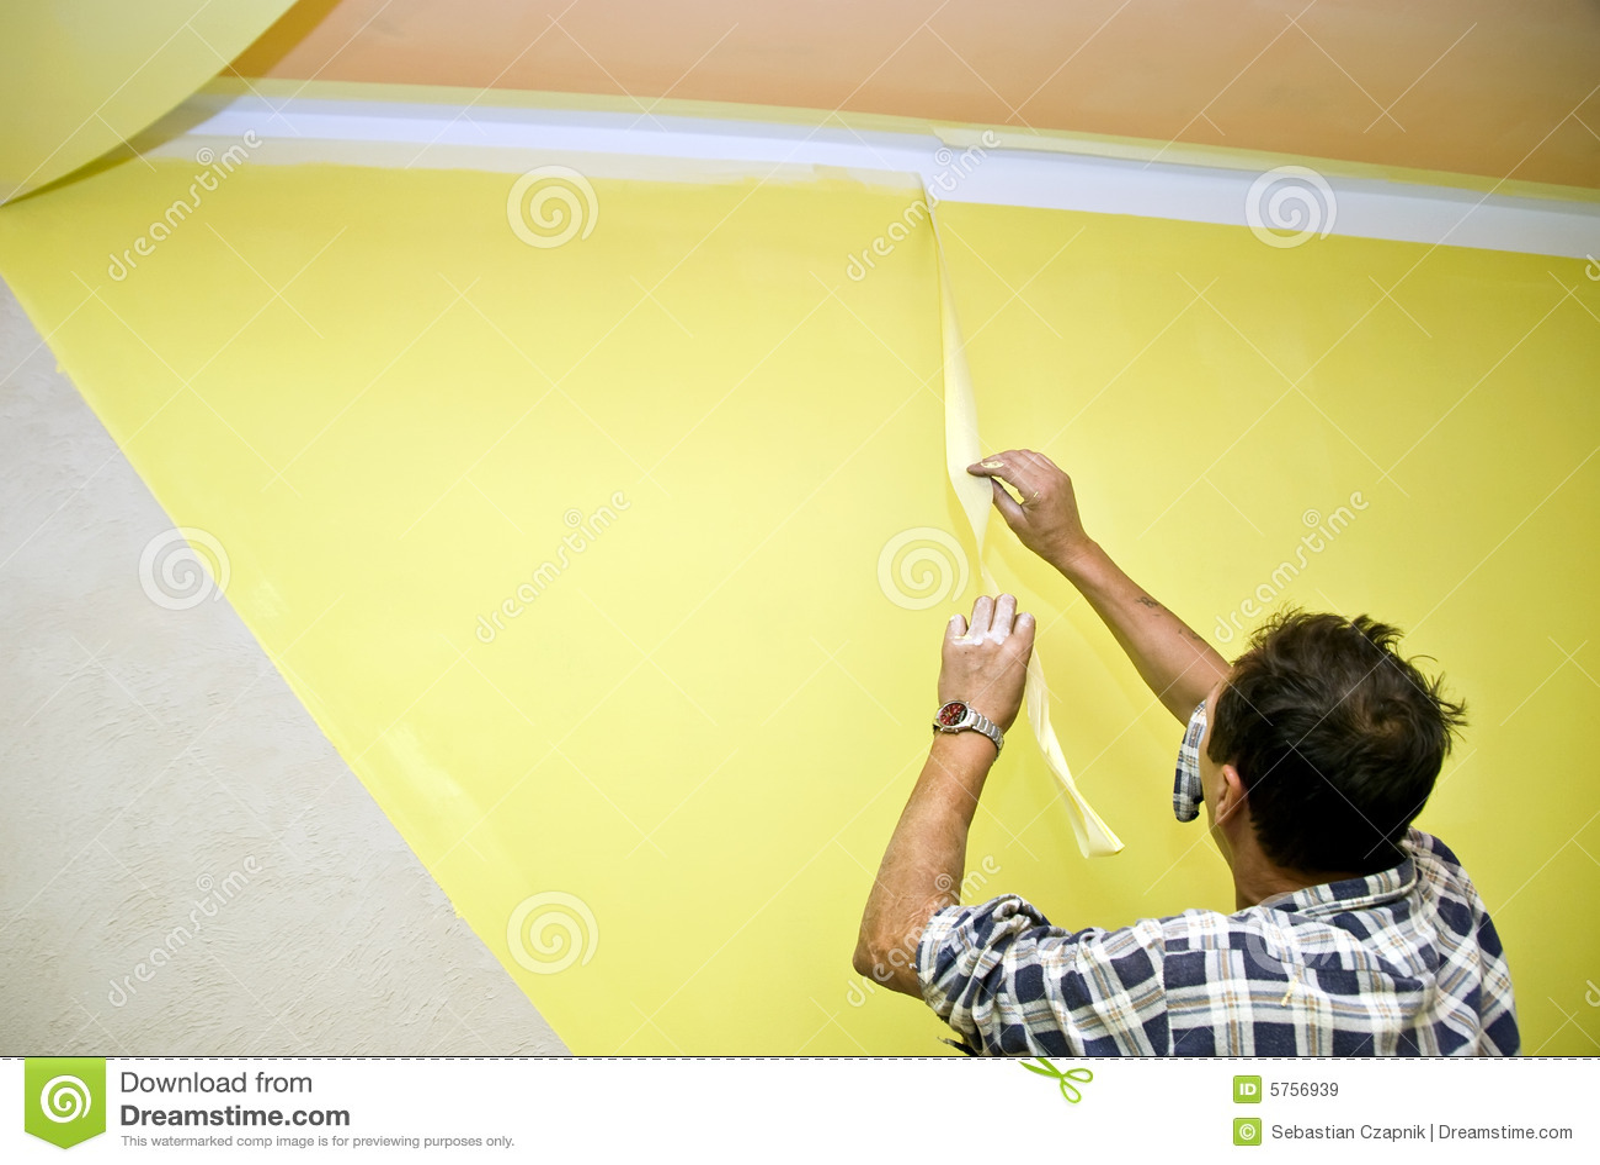 retirer la bande de peinture images libres de droits image 5756939. Black Bedroom Furniture Sets. Home Design Ideas